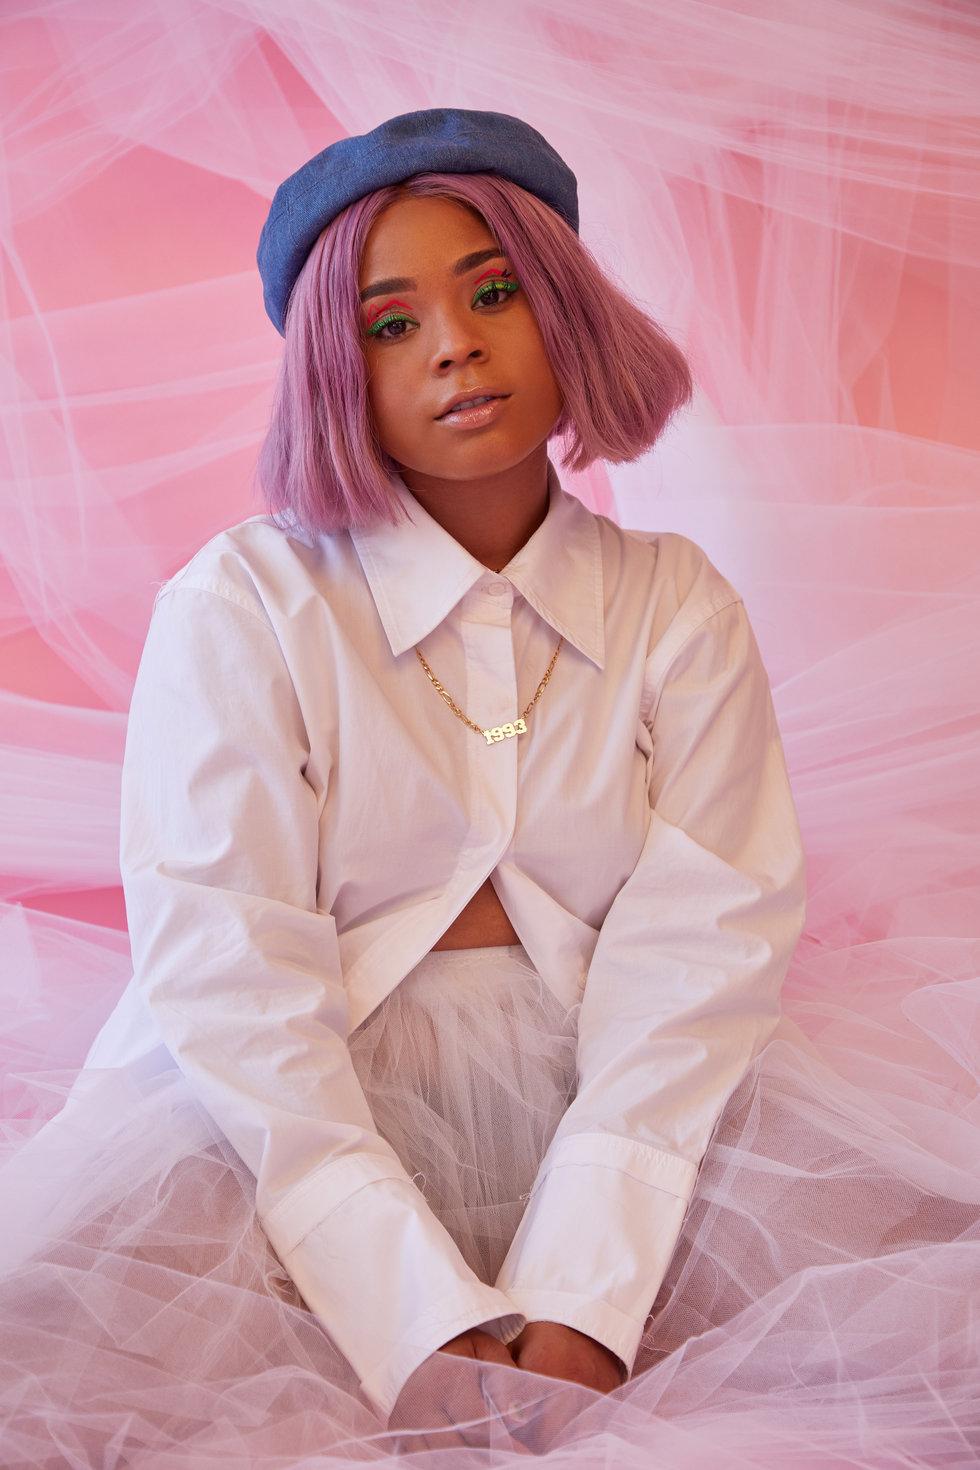 'Thank U, Next' Songwriter Tayla Parx Is Preparing Her Own Pop Love Story